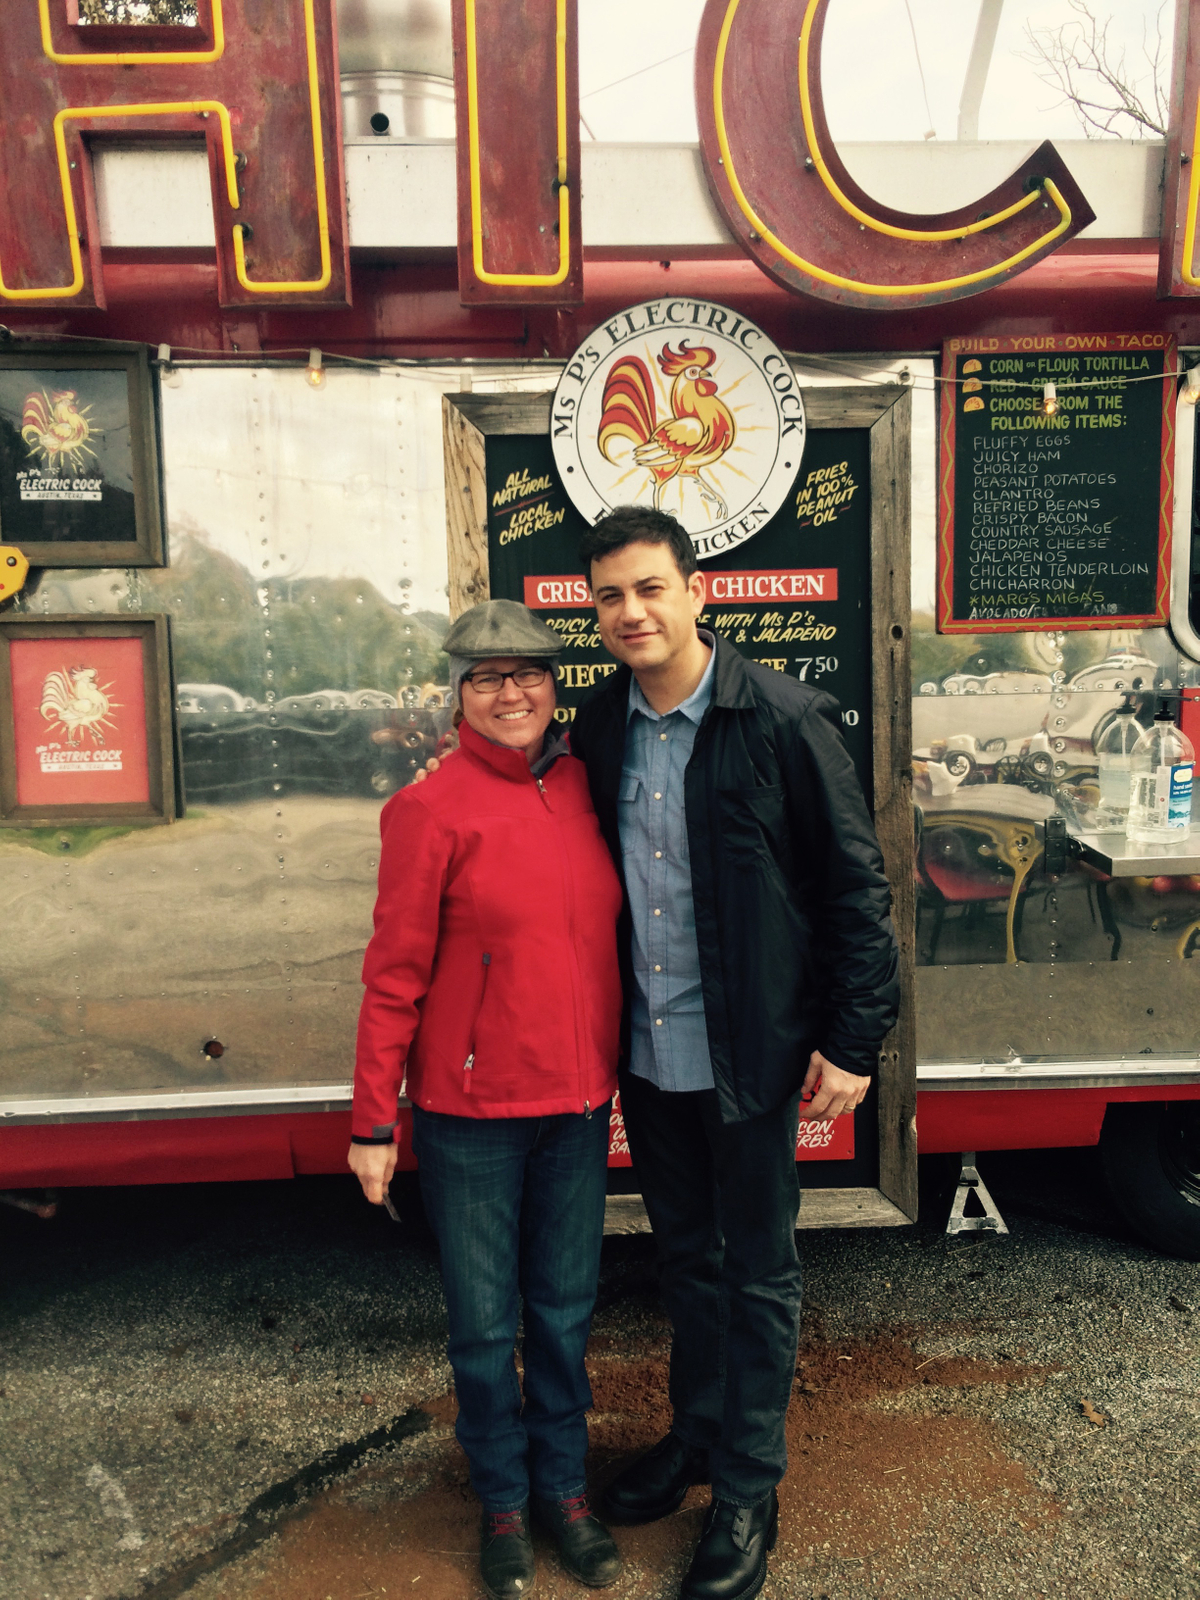 Jimmy Kimmel Live loves Ms Ps Fried Chicken SXSW Food trailer food truck restaurant startup CNBC.jpg